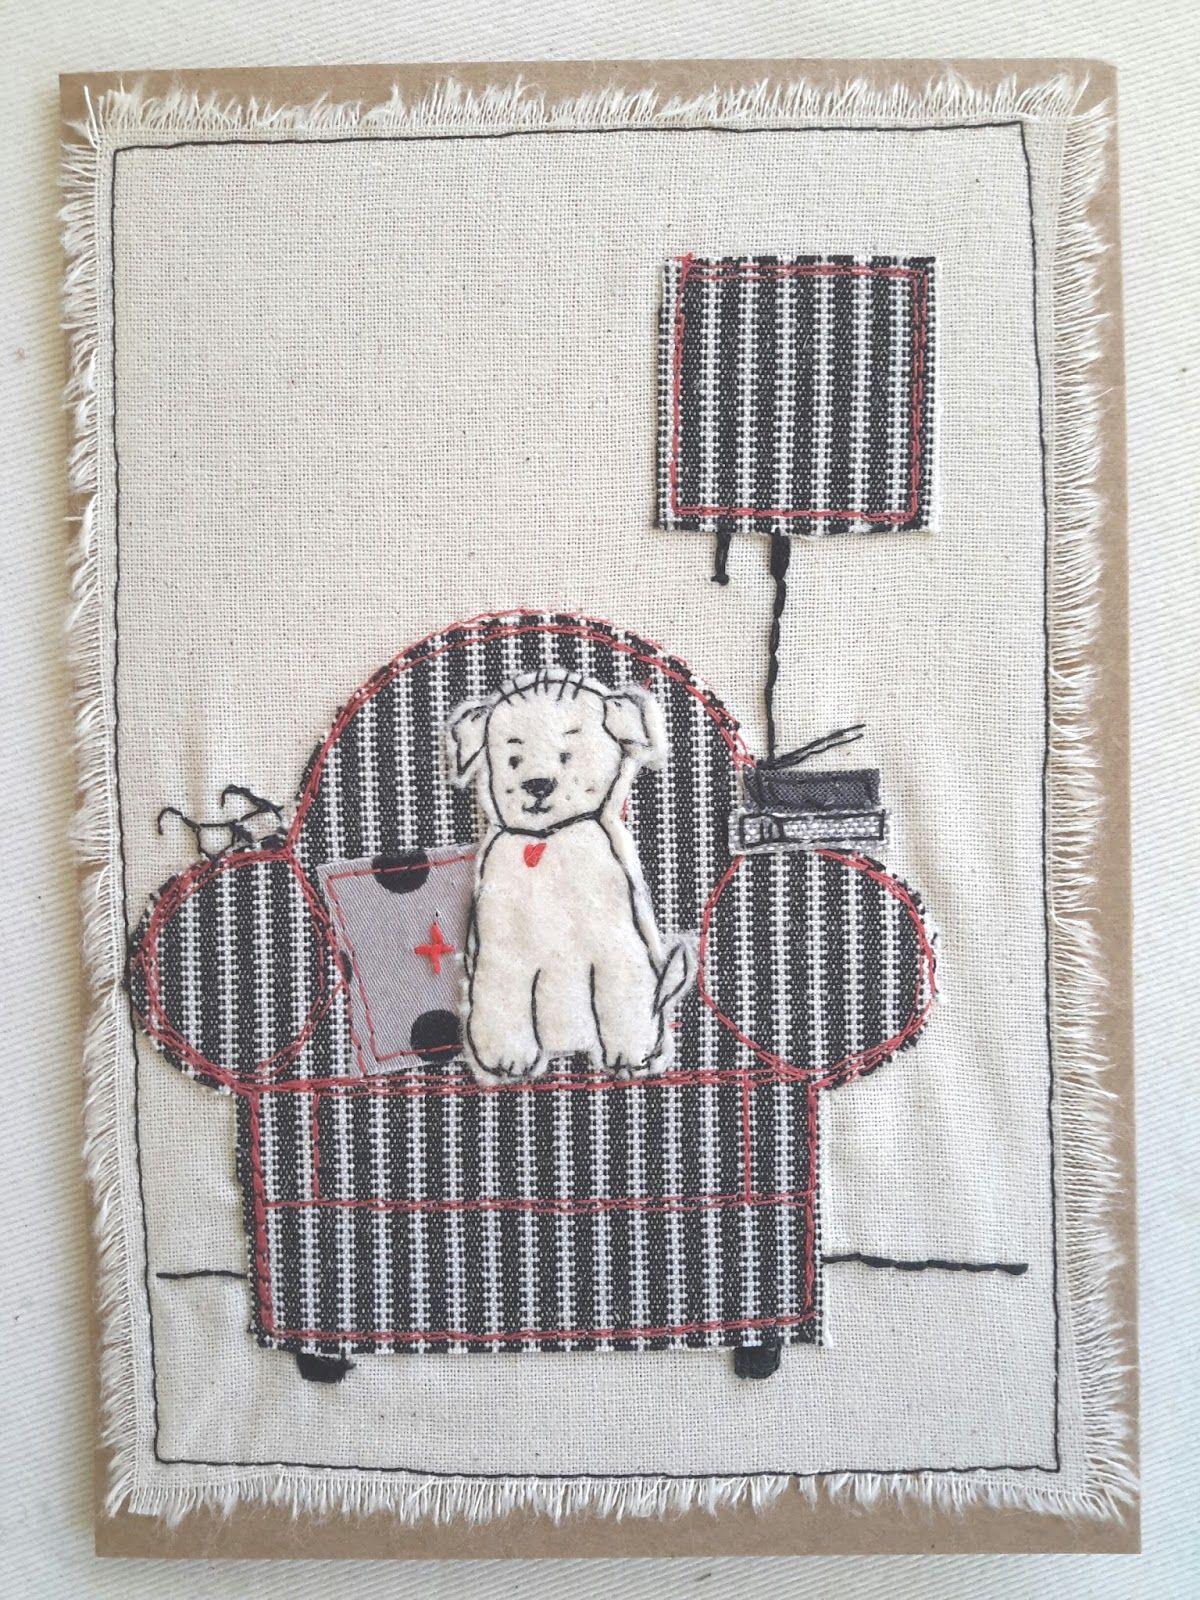 Pin by pat mcnamars on a-dogs   Pinterest